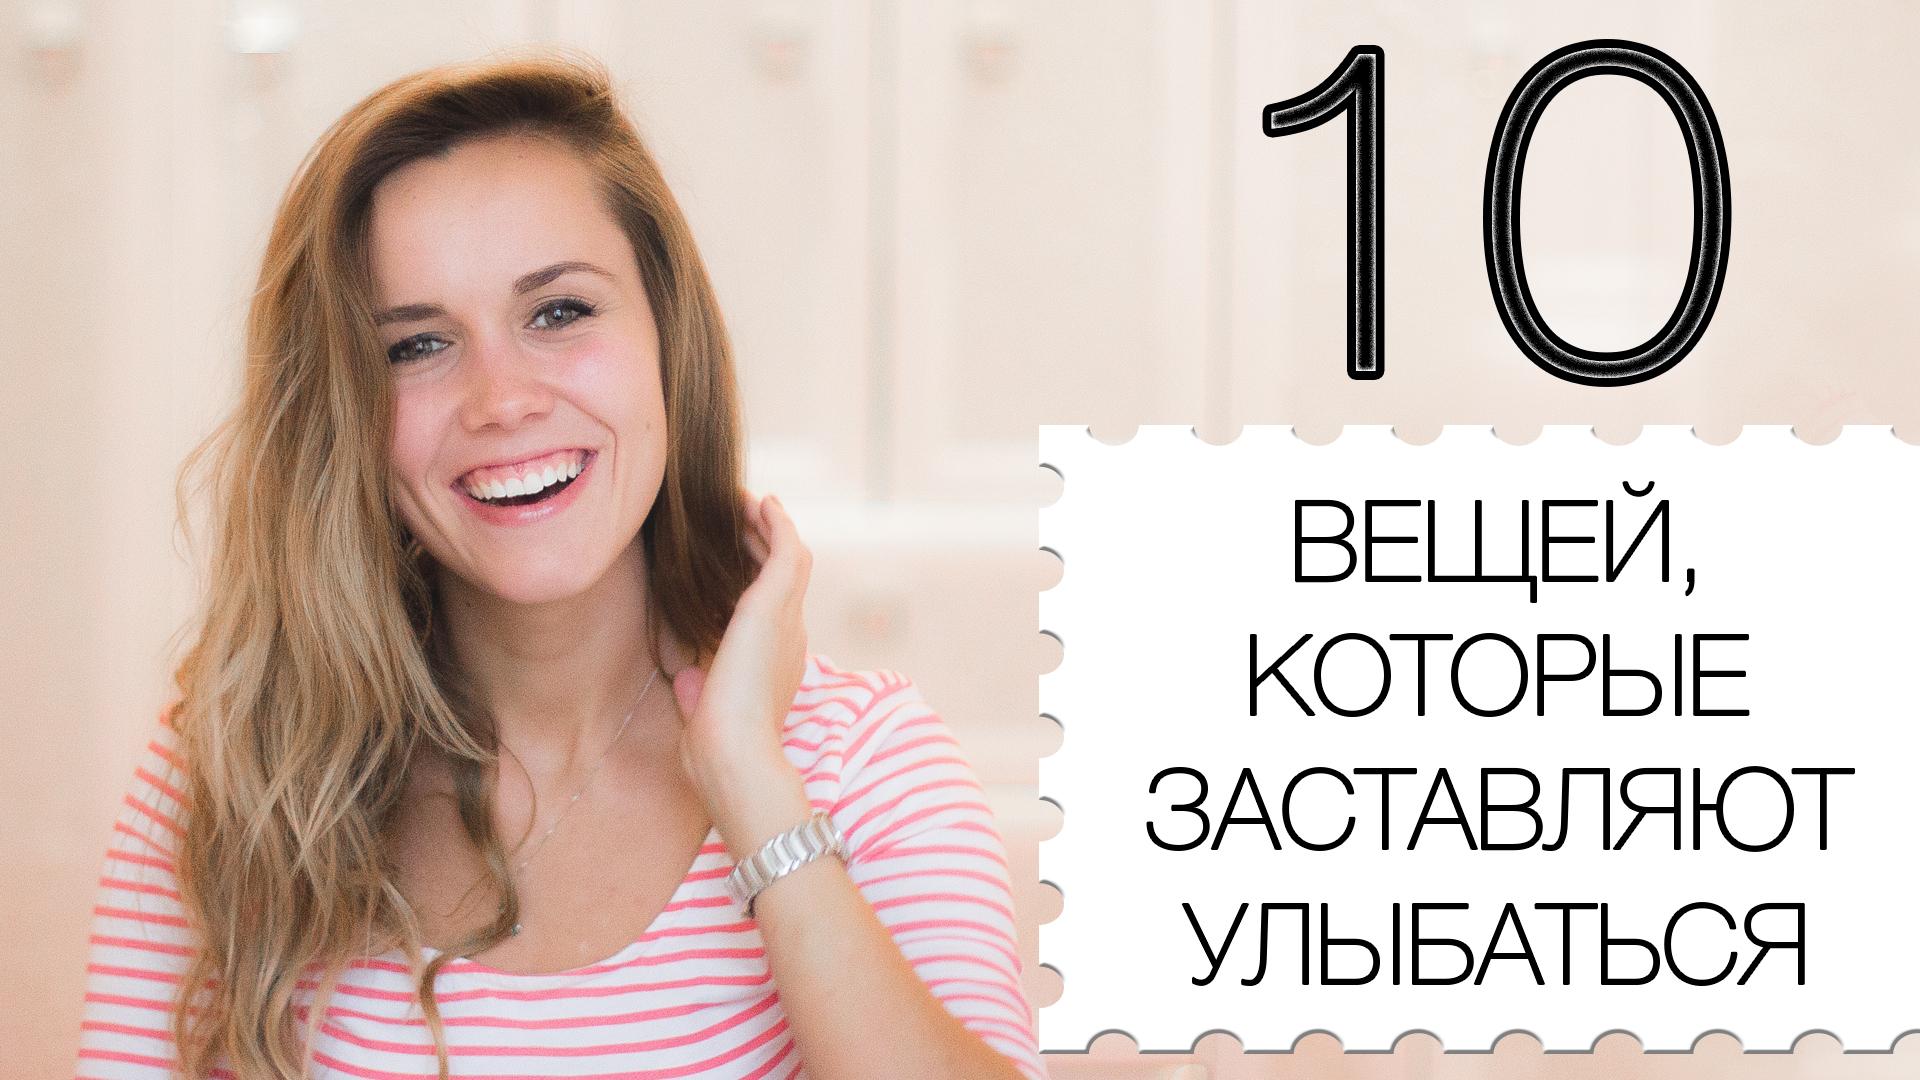 10 ylibok